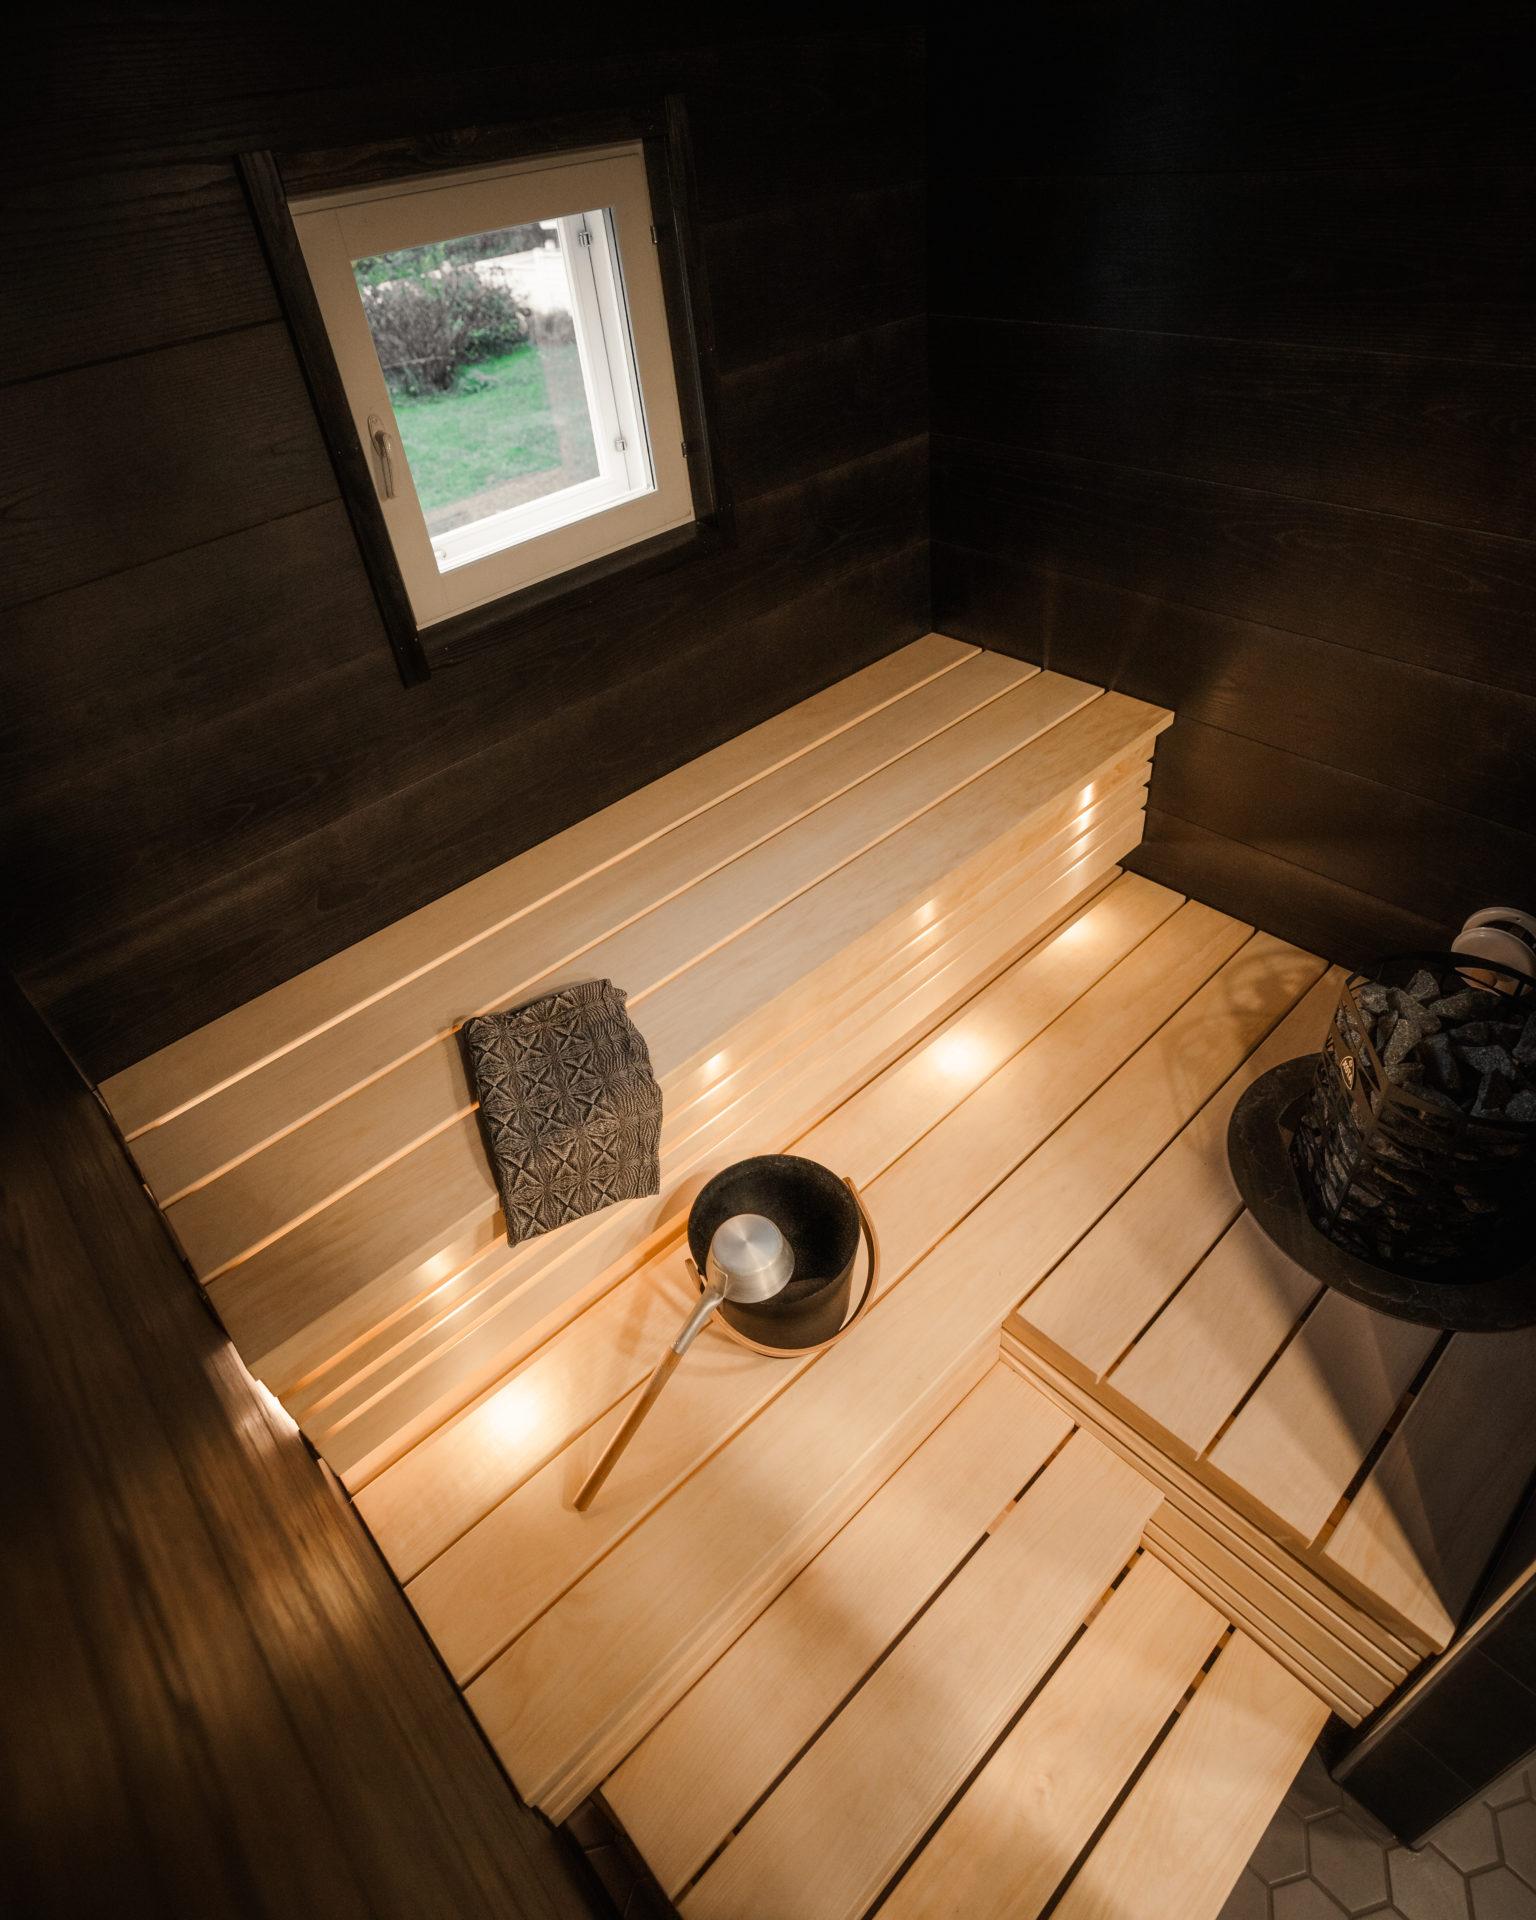 karelia puutec sauna bench